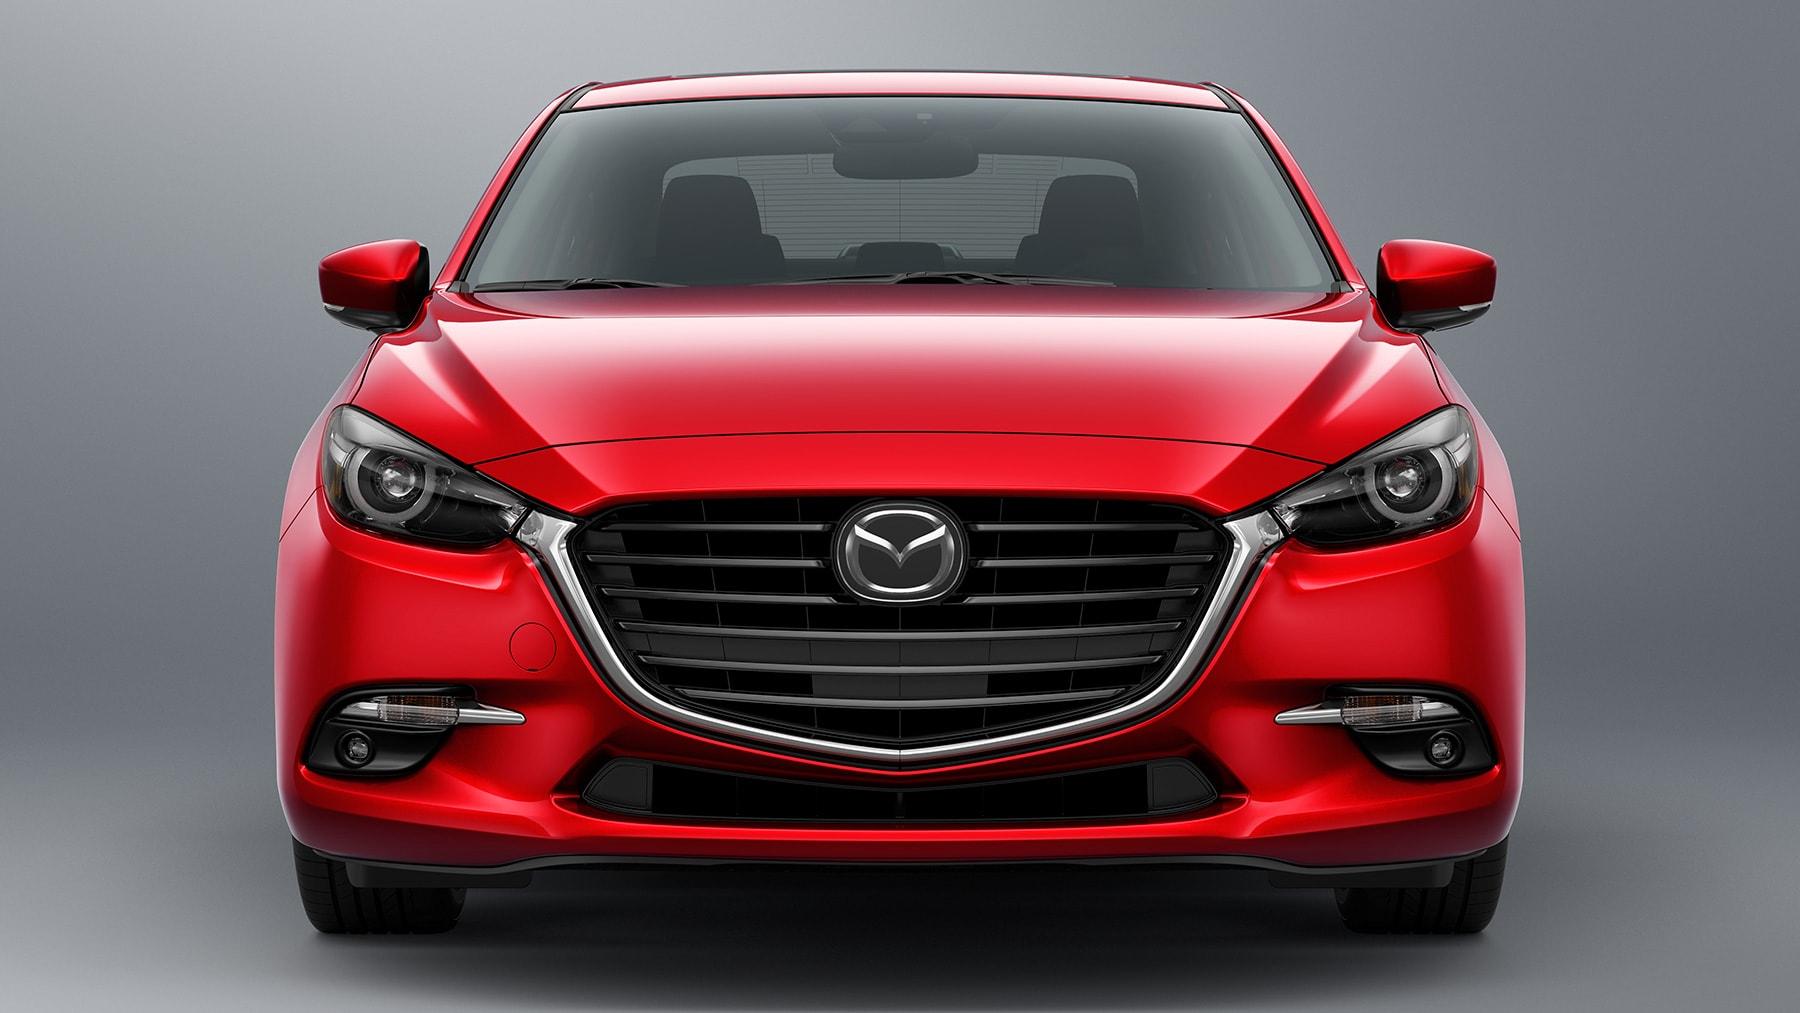 Mazda 3 Owners Manual: Exterior Care